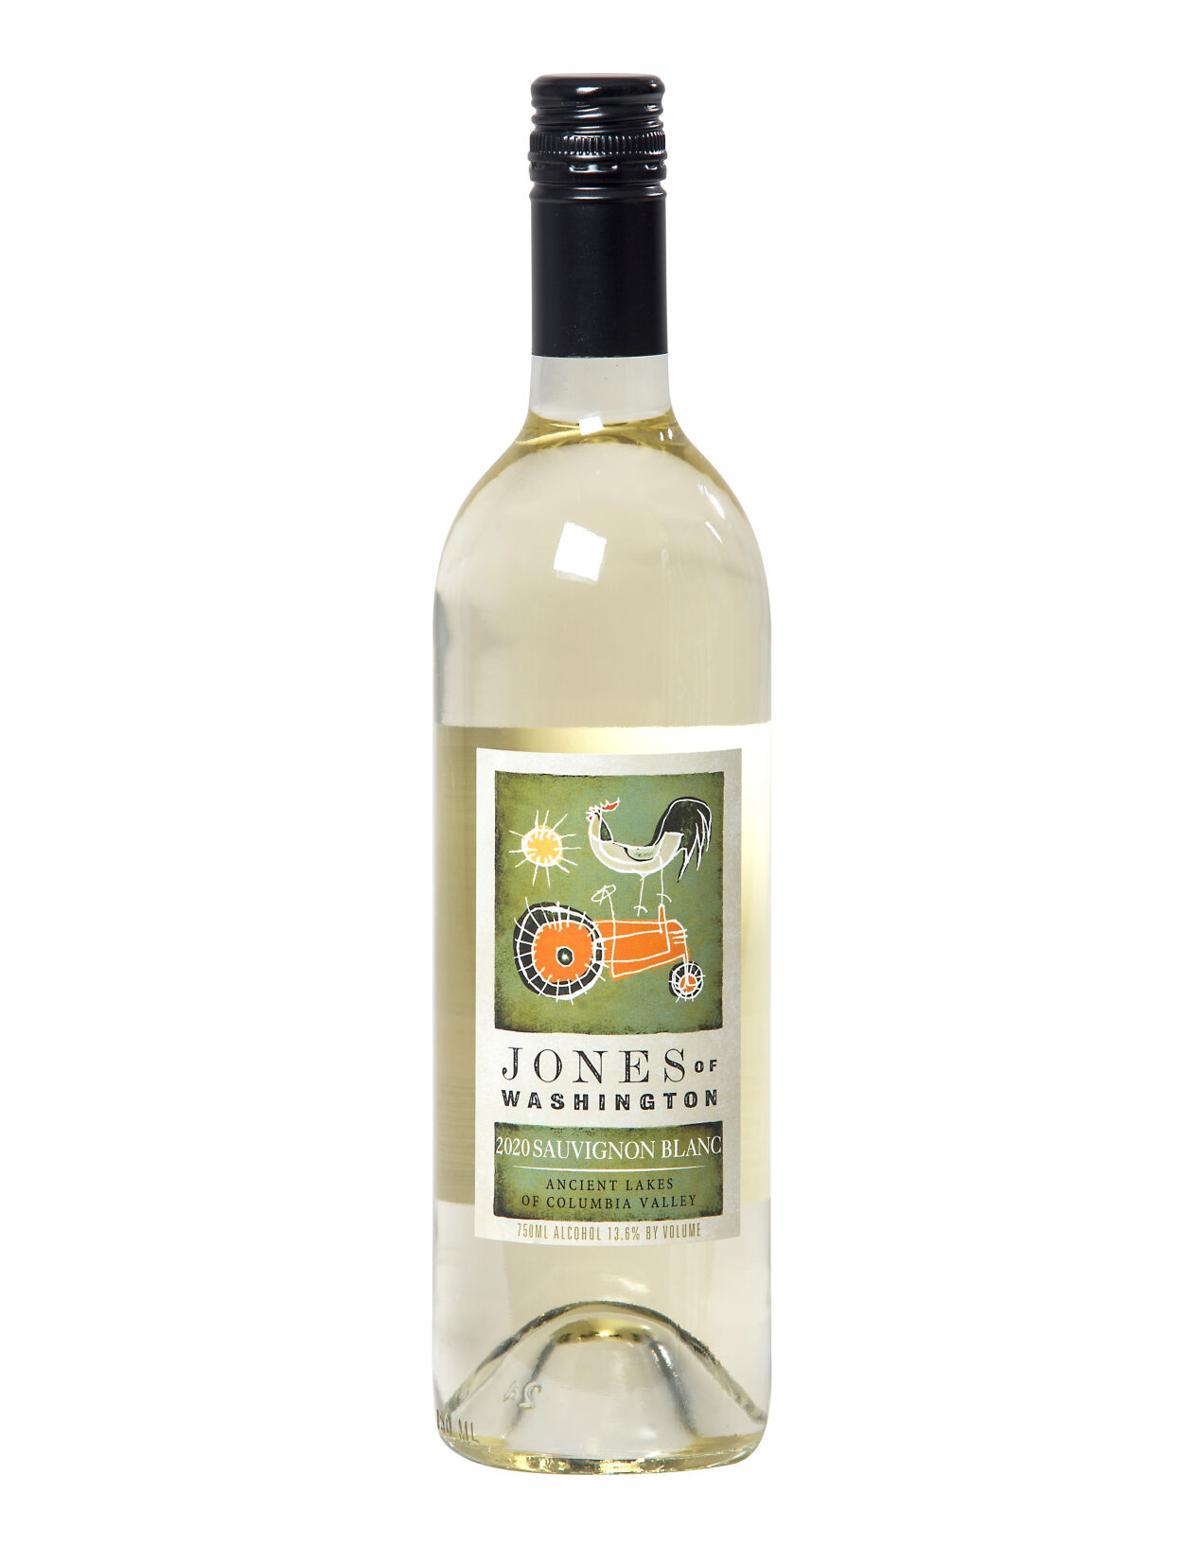 Jones of Washington 2020 Sauvignon Blanc